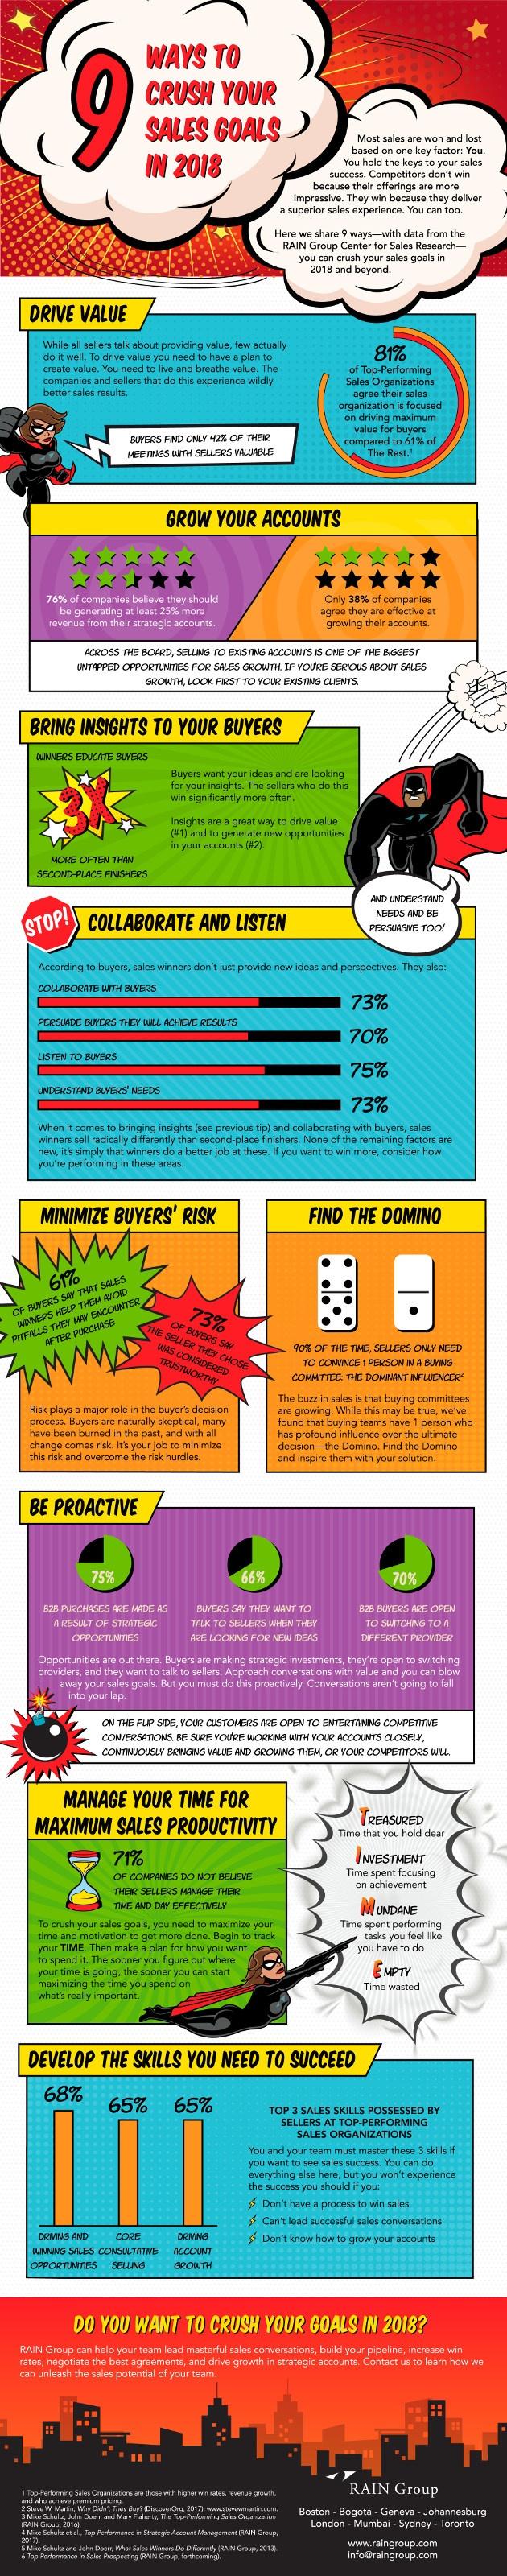 171201-infographic-nine-ways-to-crush-sales-goals.jpg